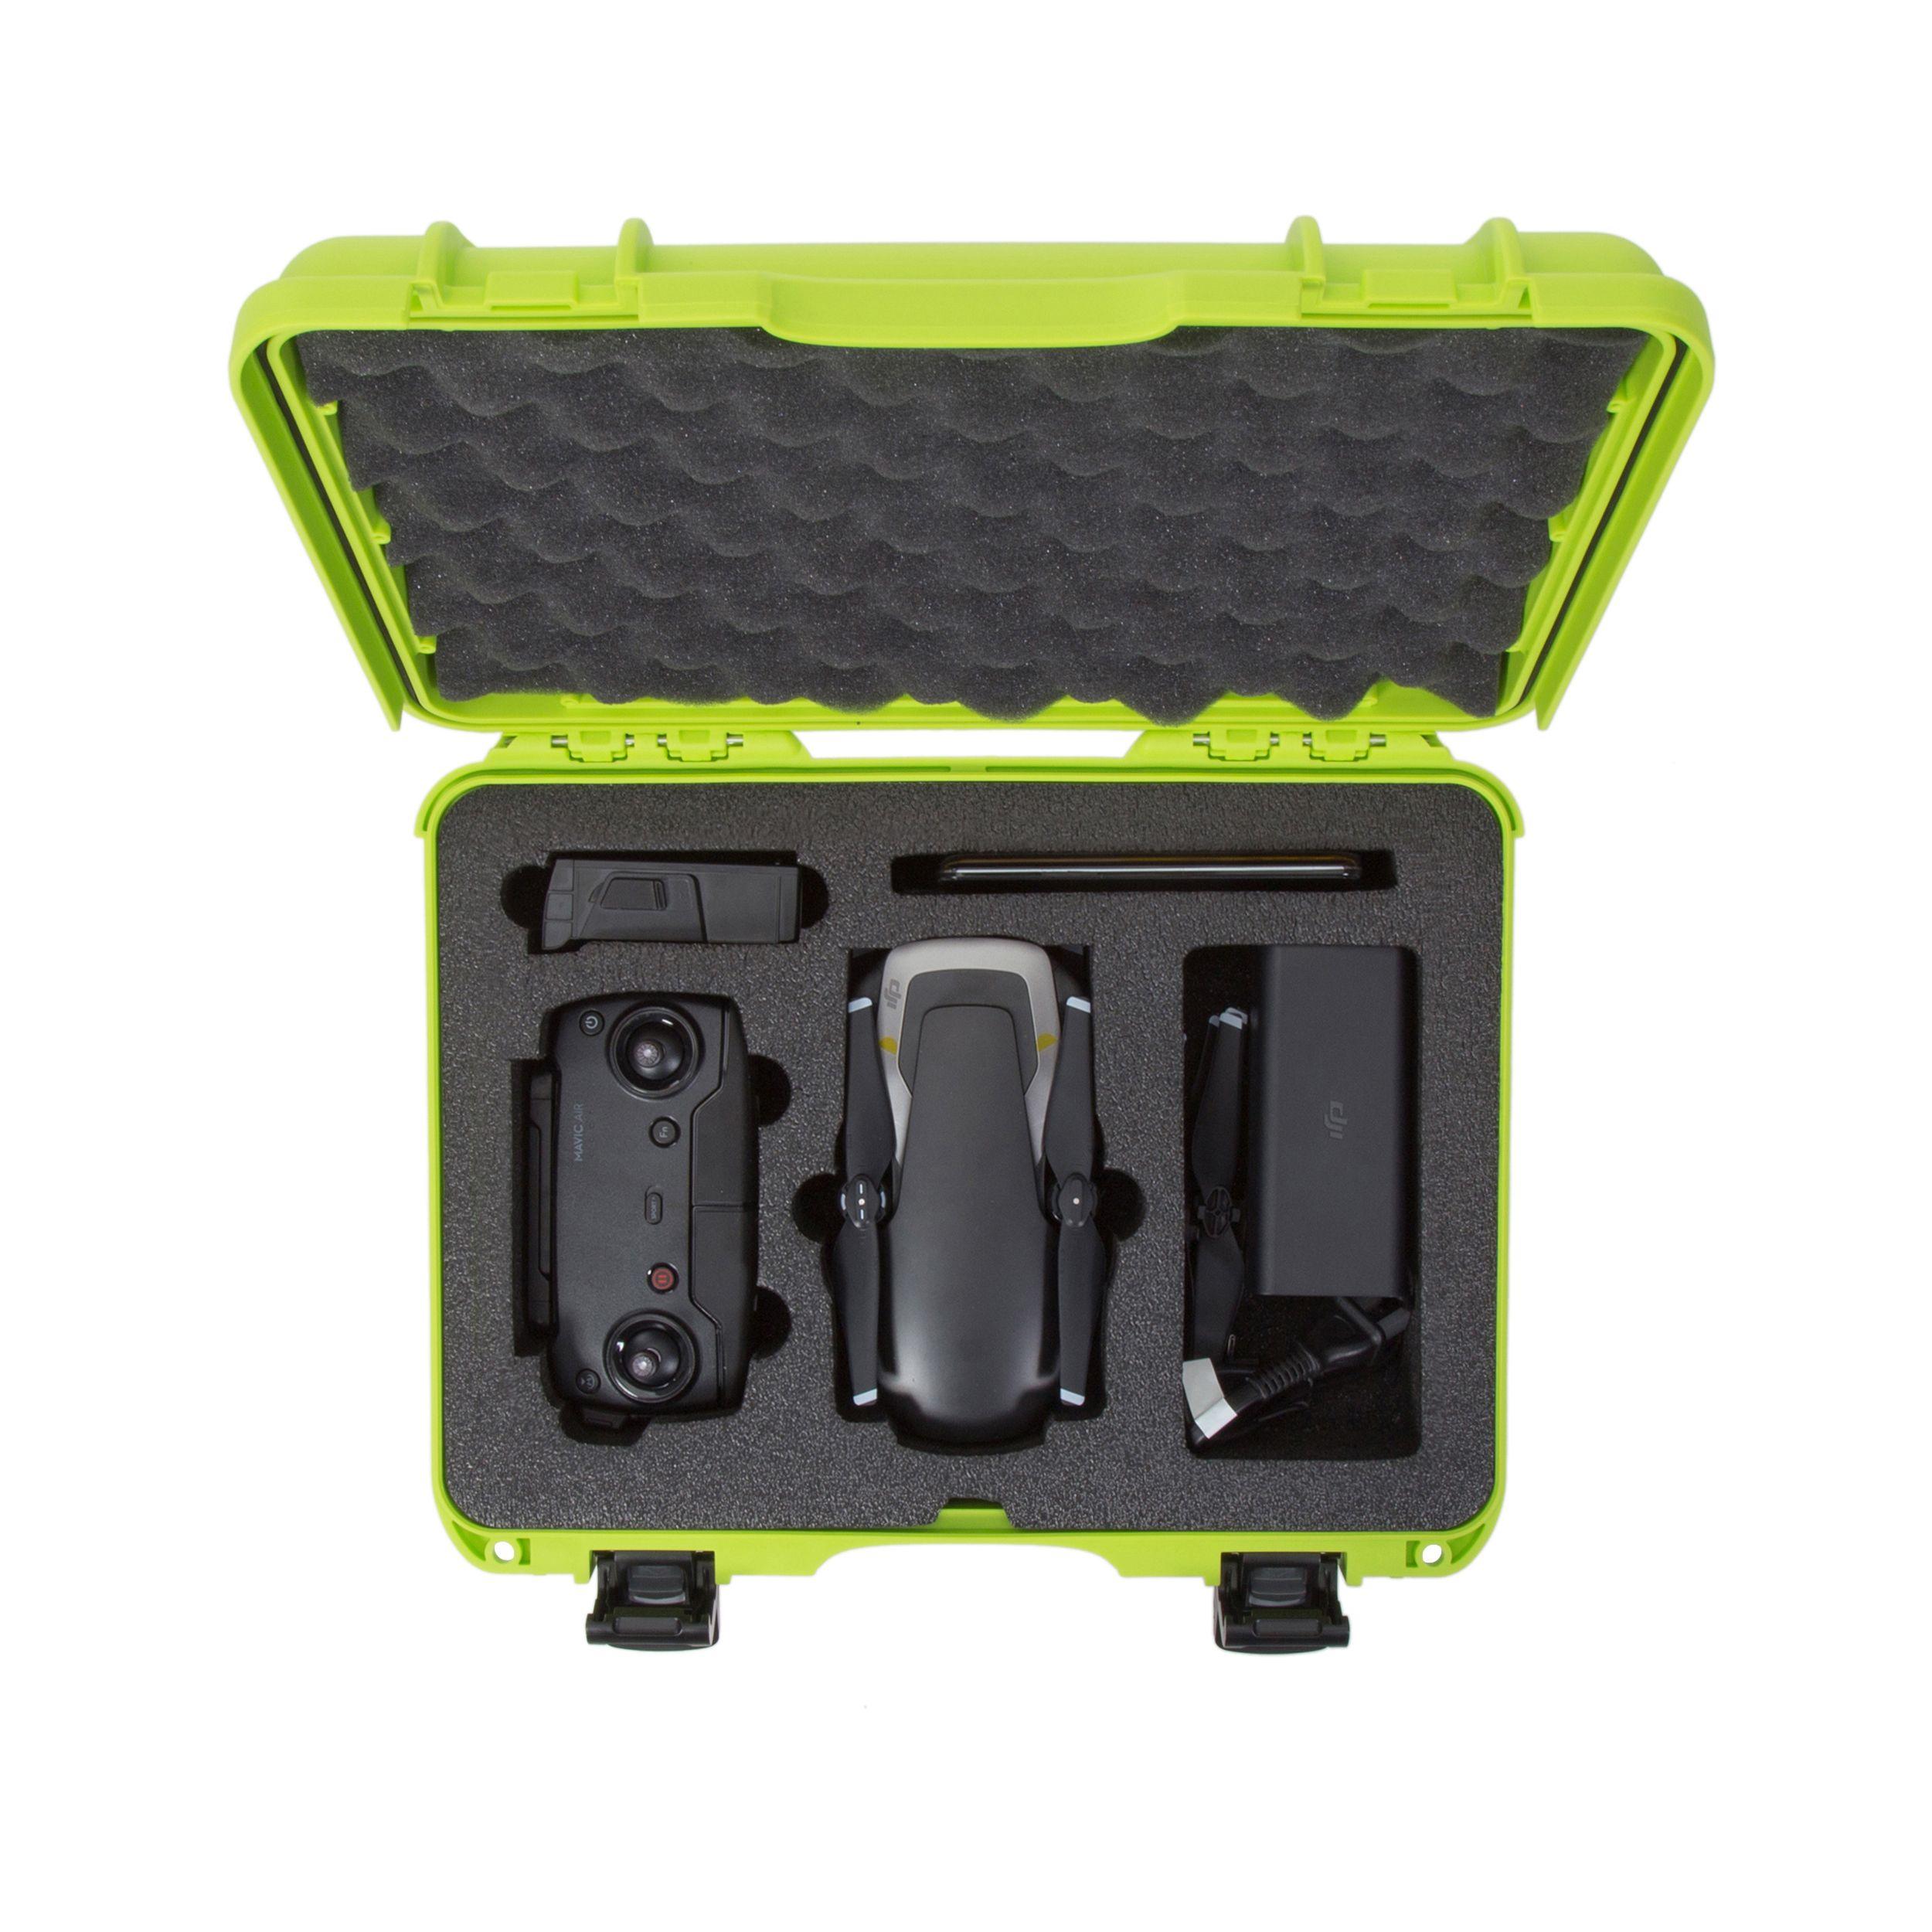 NANUK 915 For DJI Mavic Air 2 Fly More Water proof case